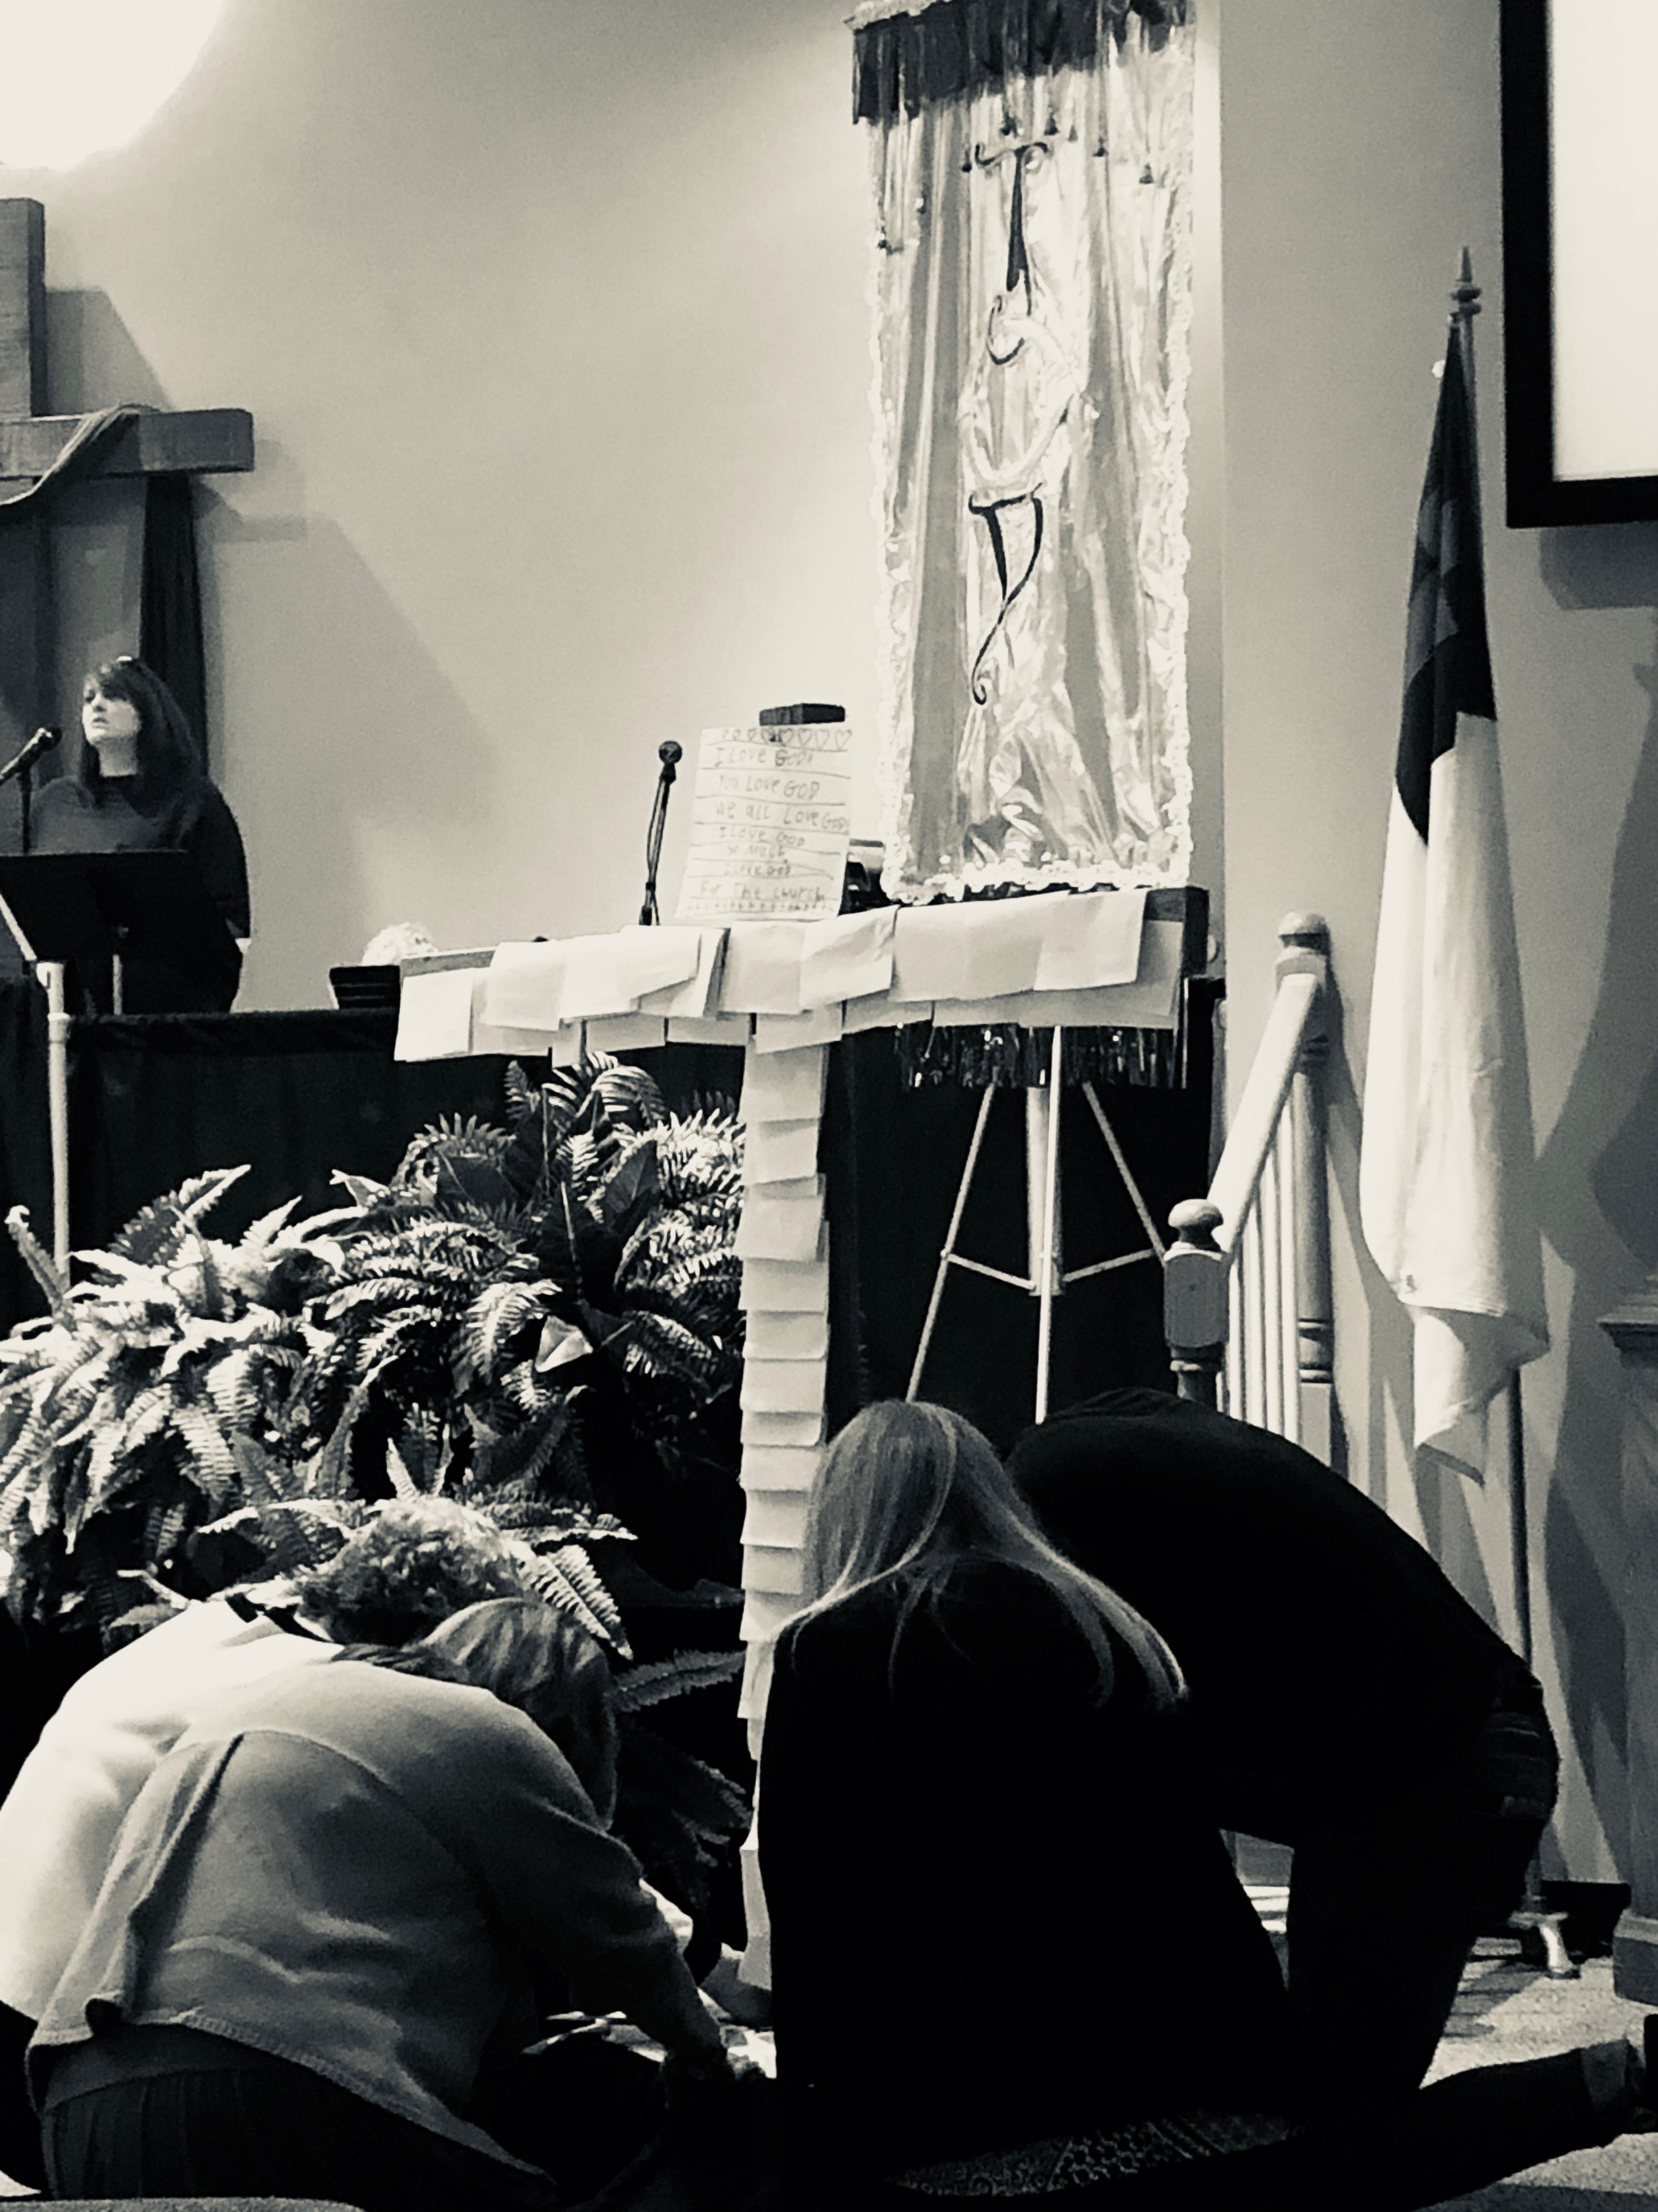 Youth in Church.JPG